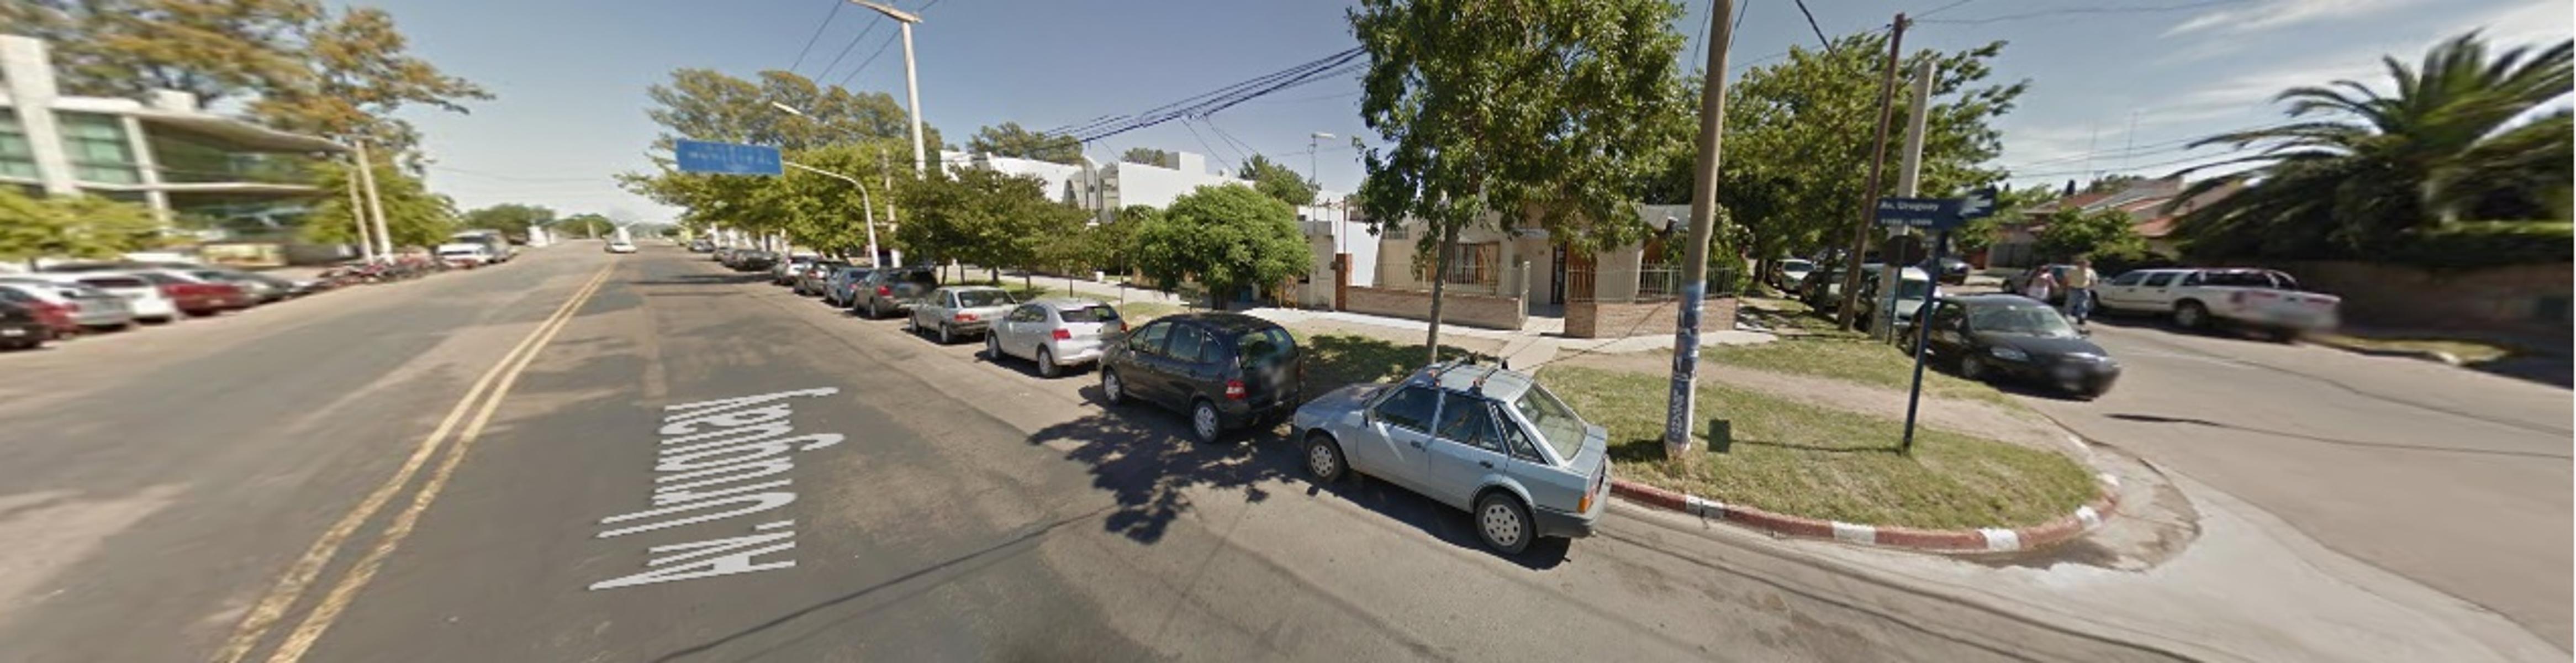 FONDO DE COMERCIO: Almazen - Mercado Saludable, Mauro Martin Negocios Inmobiliarios